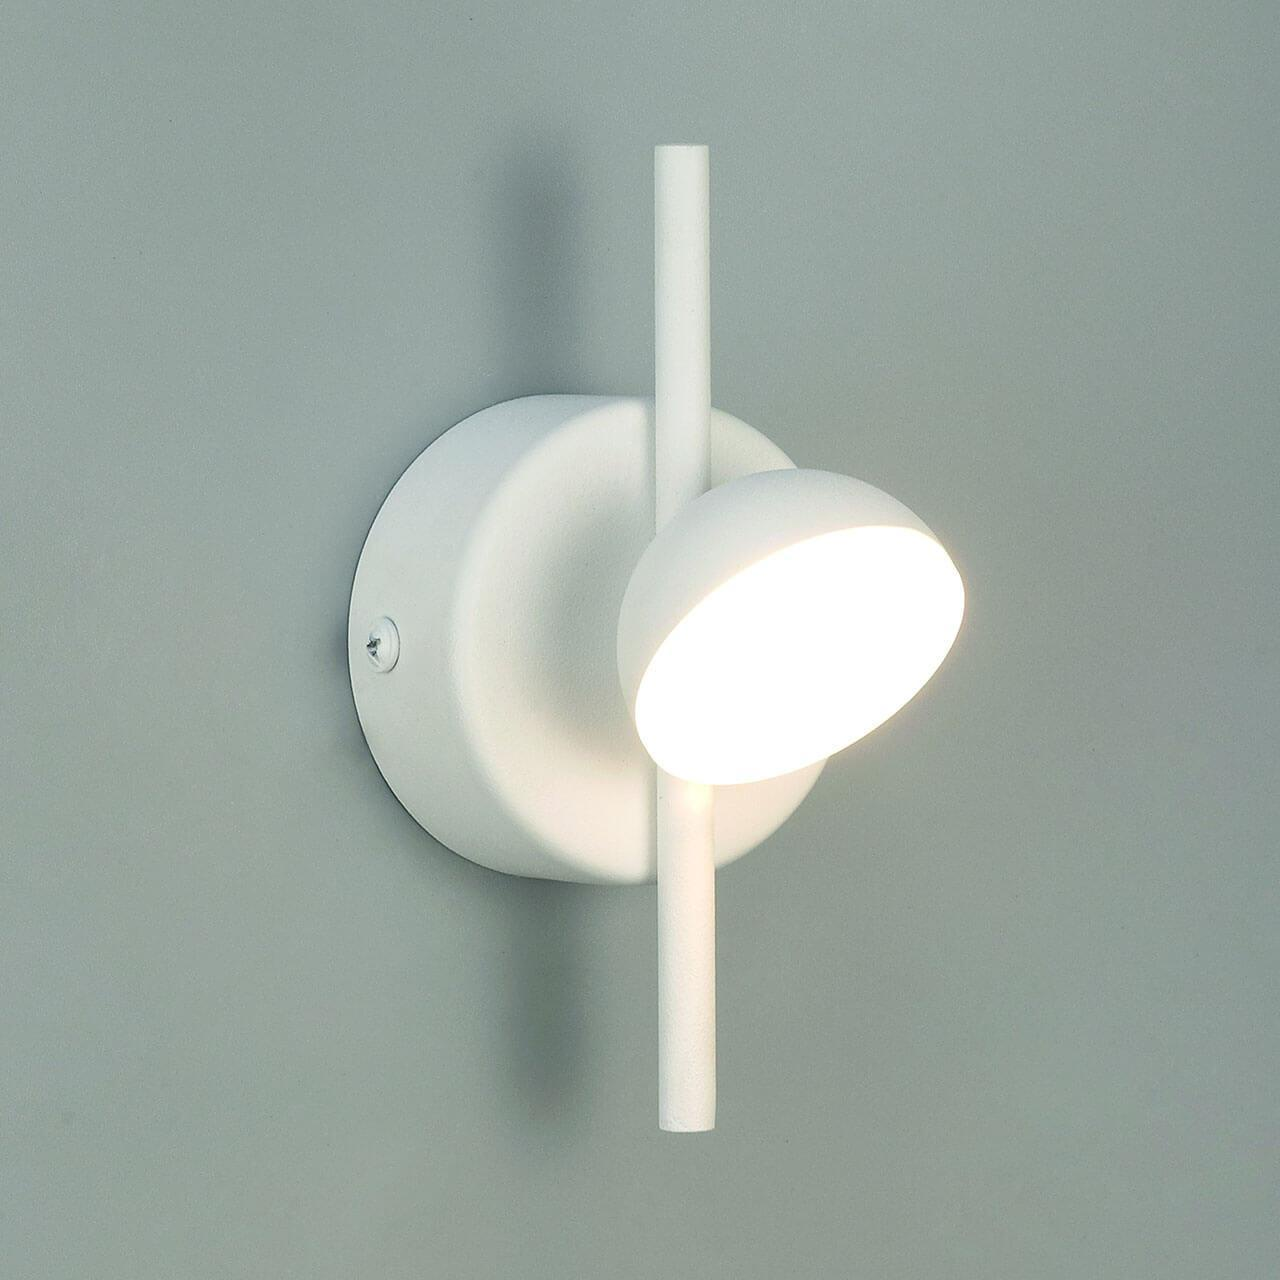 Бра Mantra 6266, LED, 3 Вт бра mantra adn mn 6265